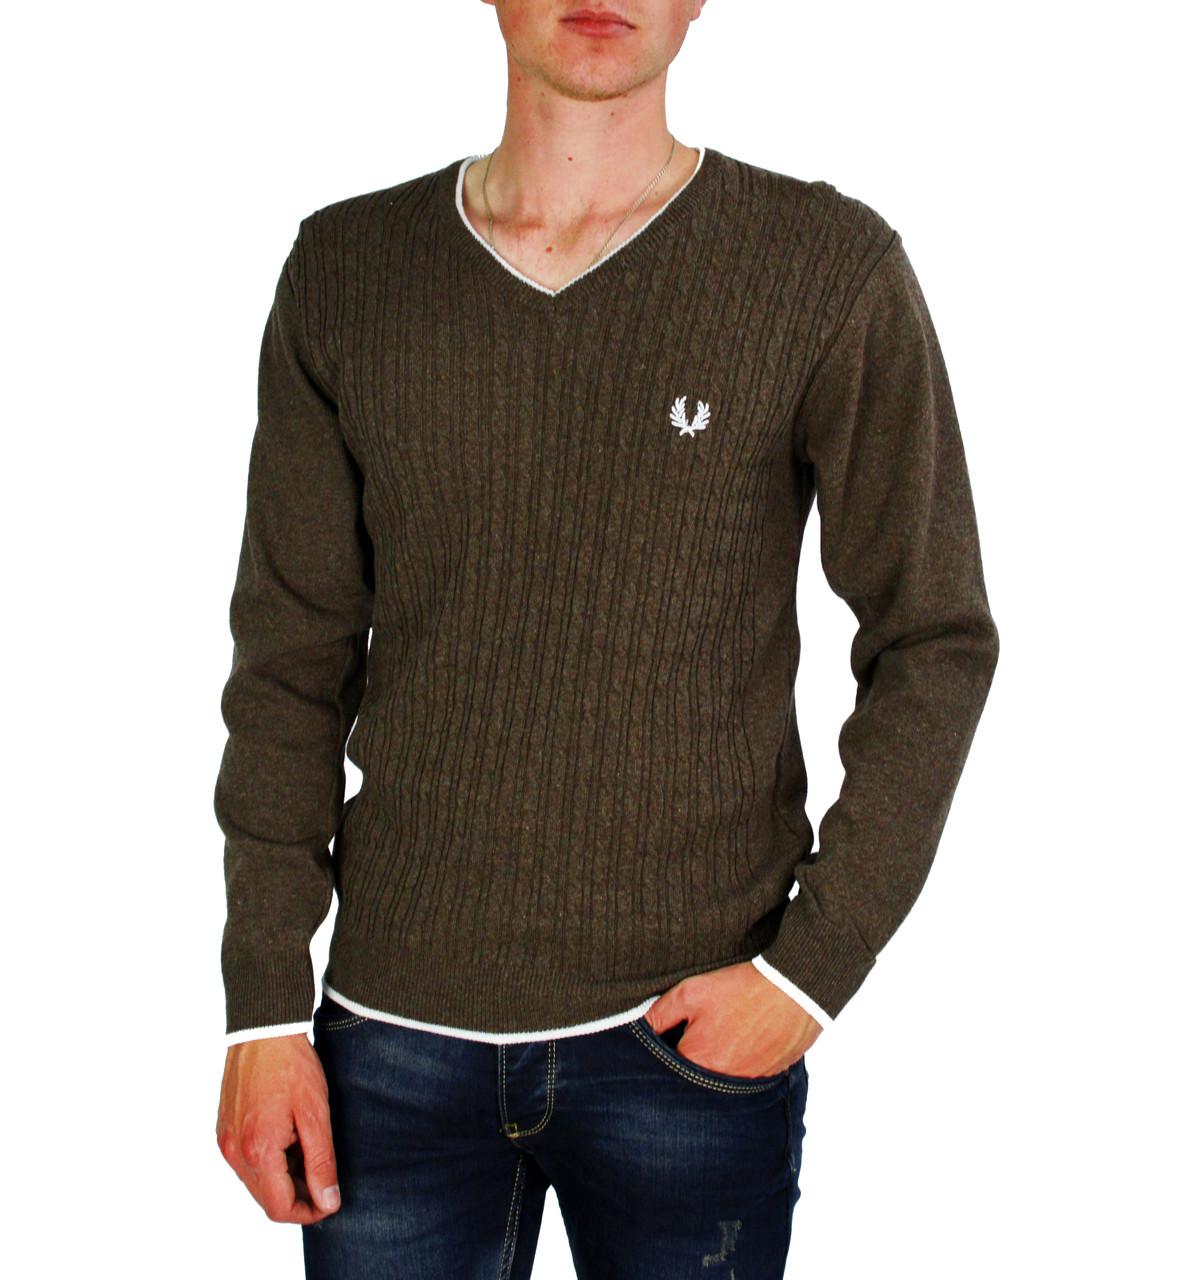 Коричневый свитер мужской, джемпер GAVINO